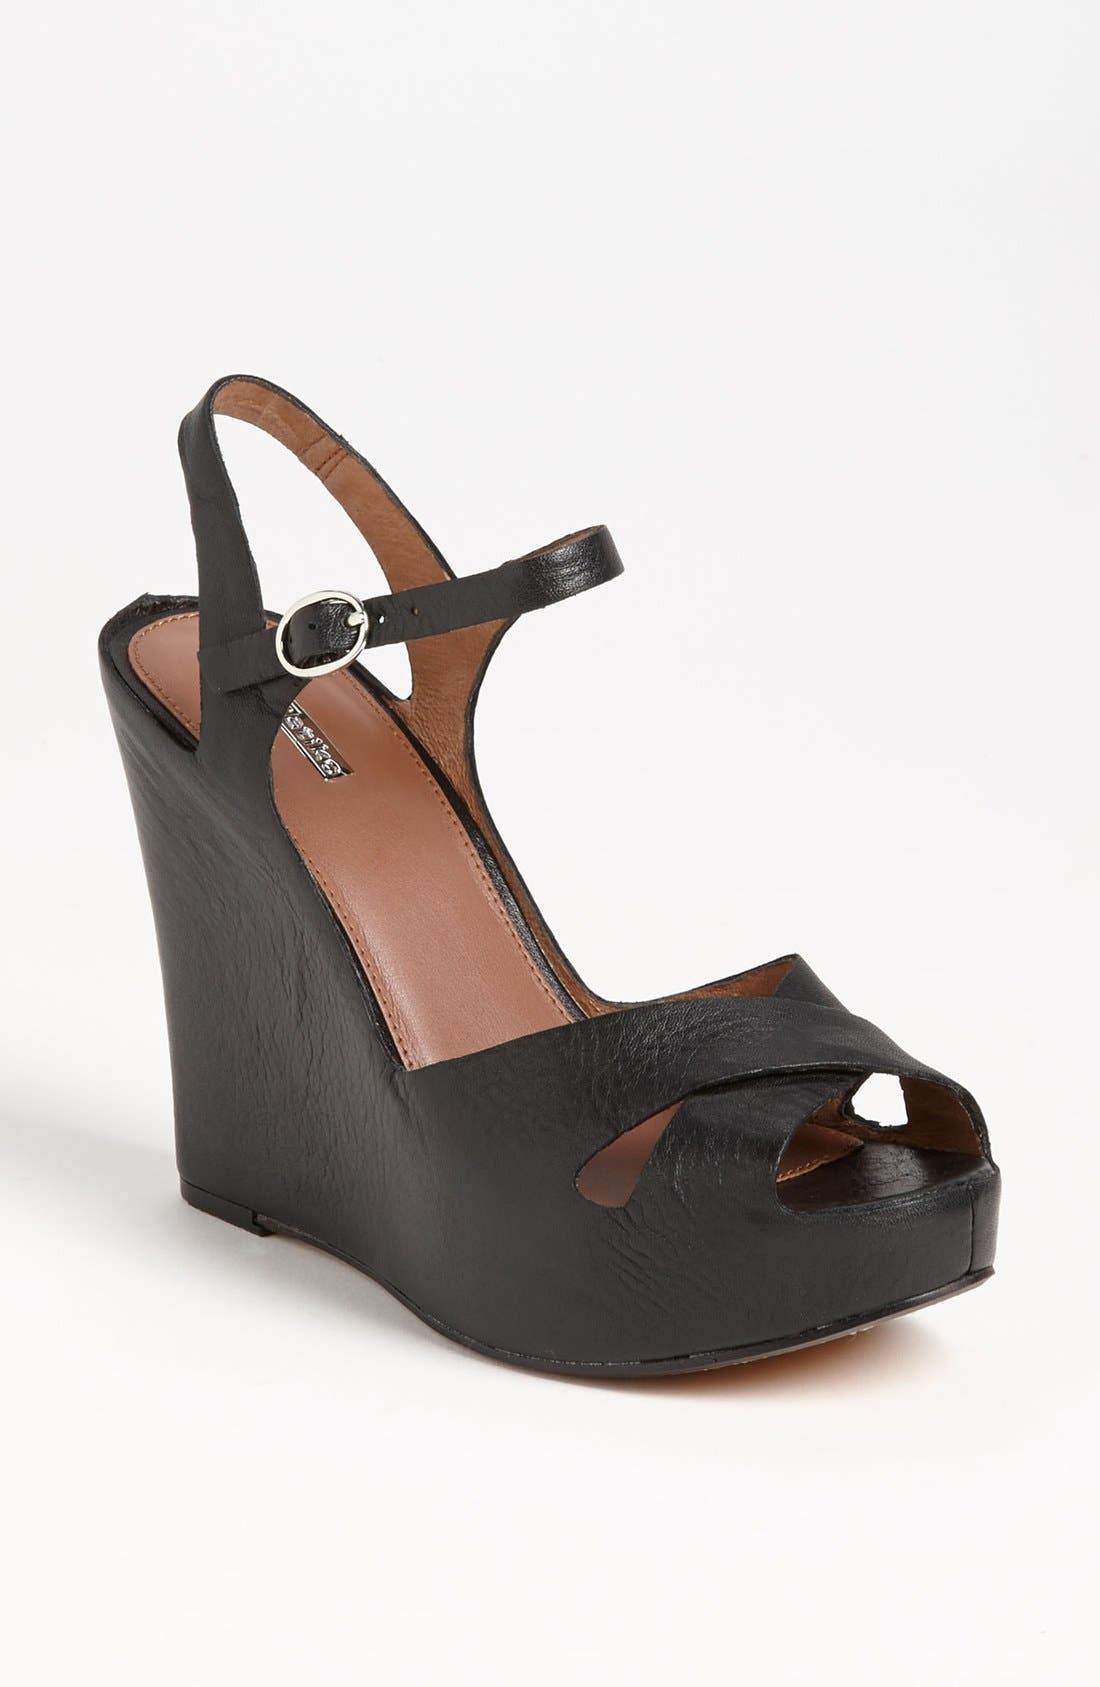 Main Image - Matiko 'Lynn' Wedge Sandal